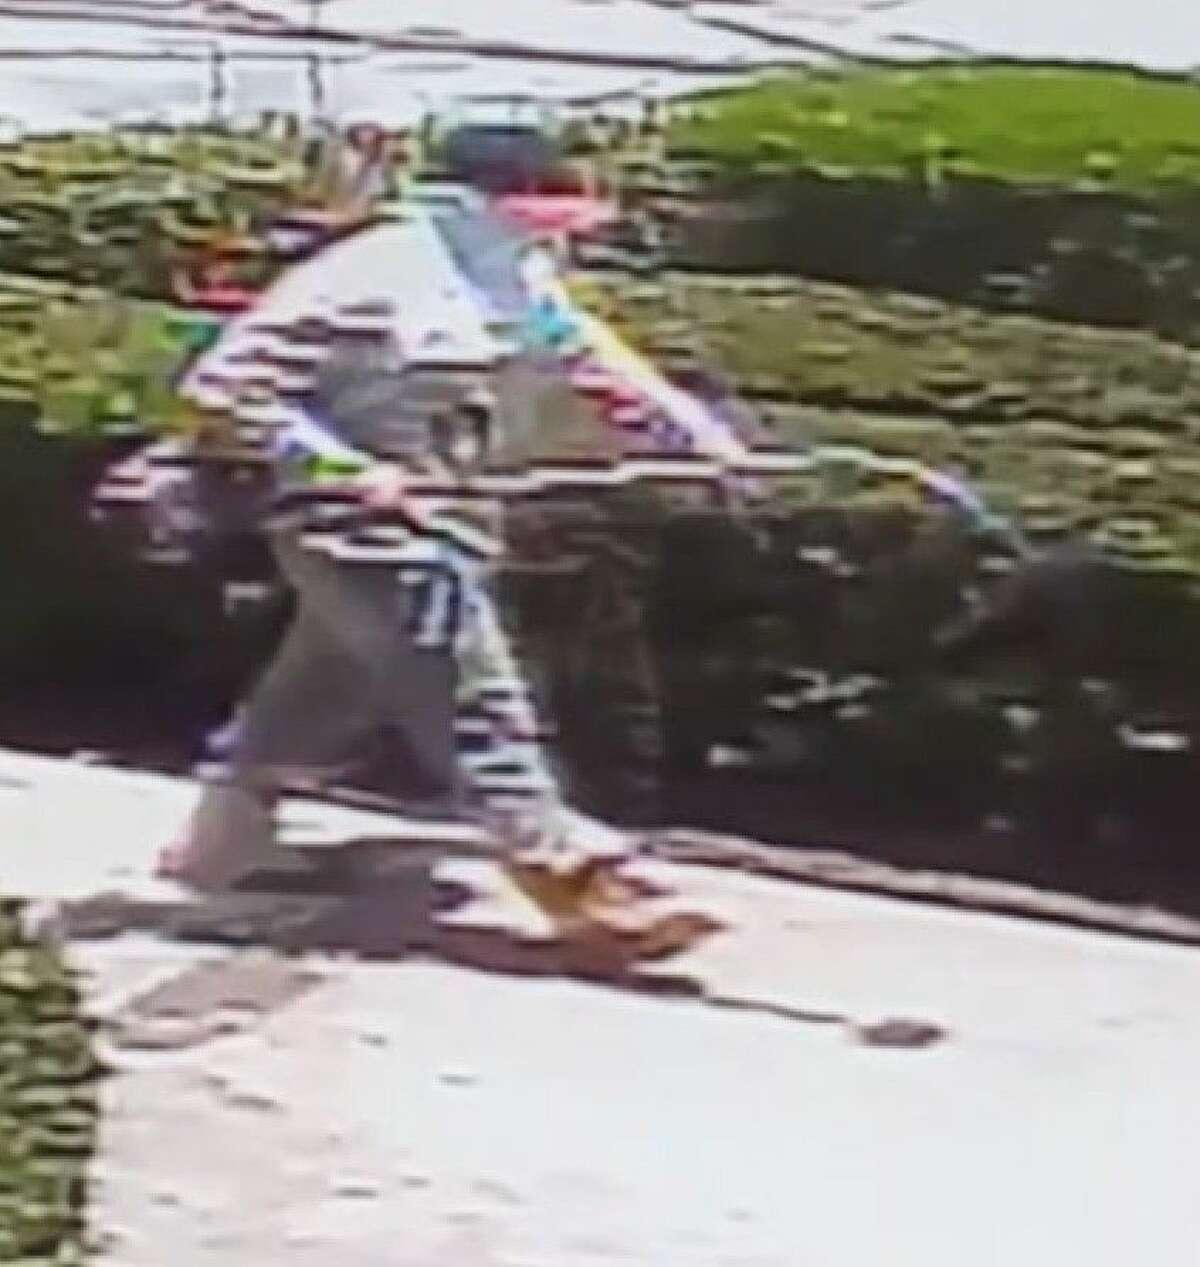 Surveillance photo of the Sonic suspect.